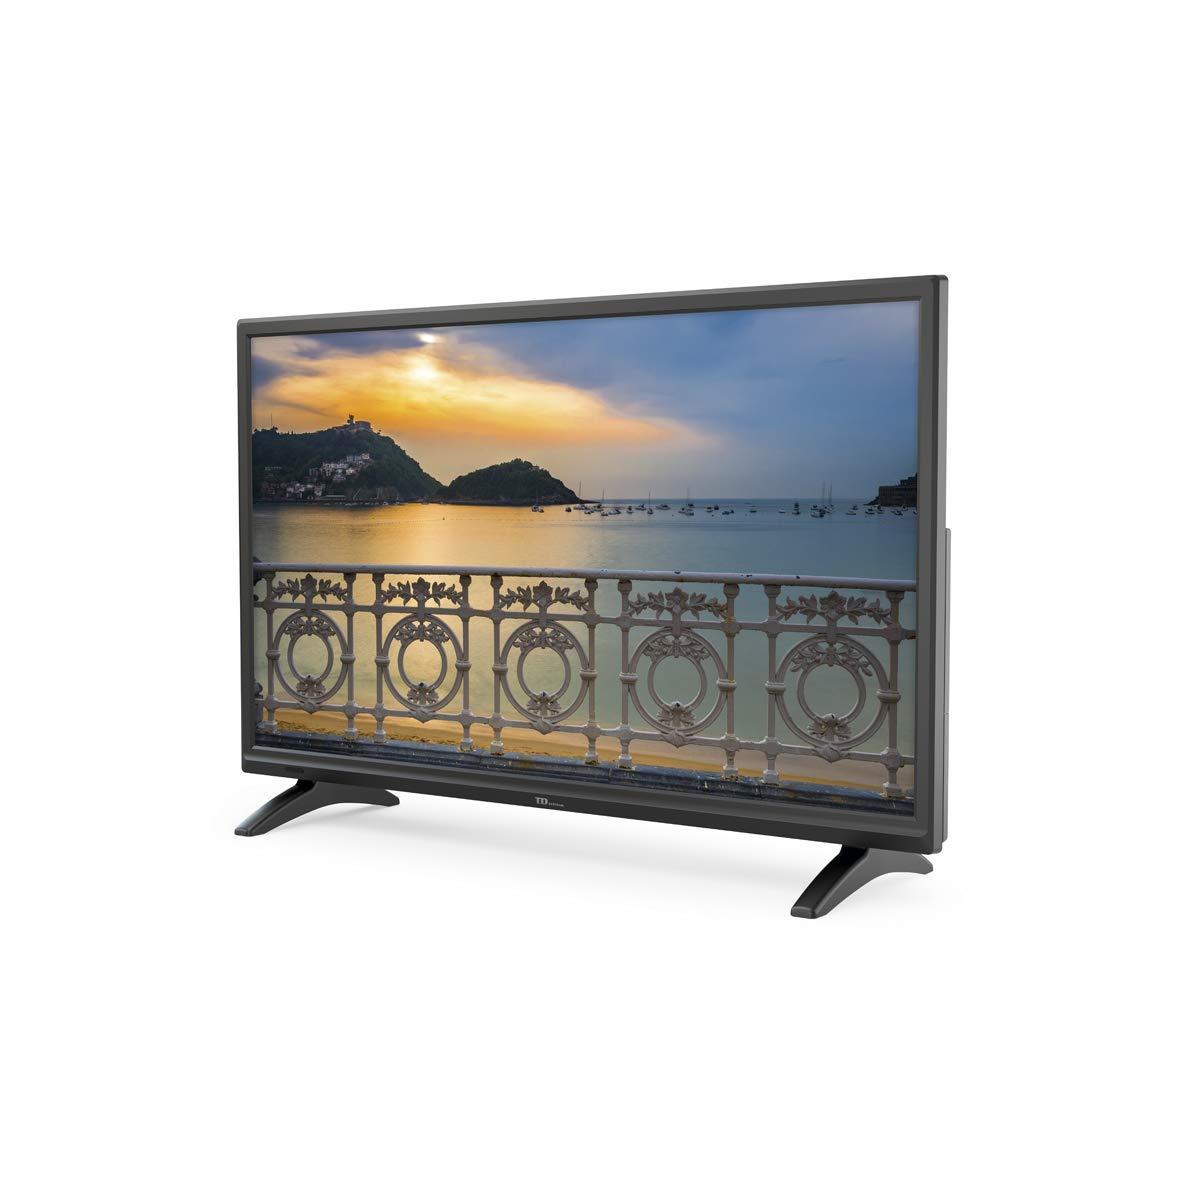 TD Systems K24DLM8HS - Televisor Led 24 Pulgadas HD Smart, resolución 1366 x 768, HDMI, VGA, 2X USB, Smart TV.